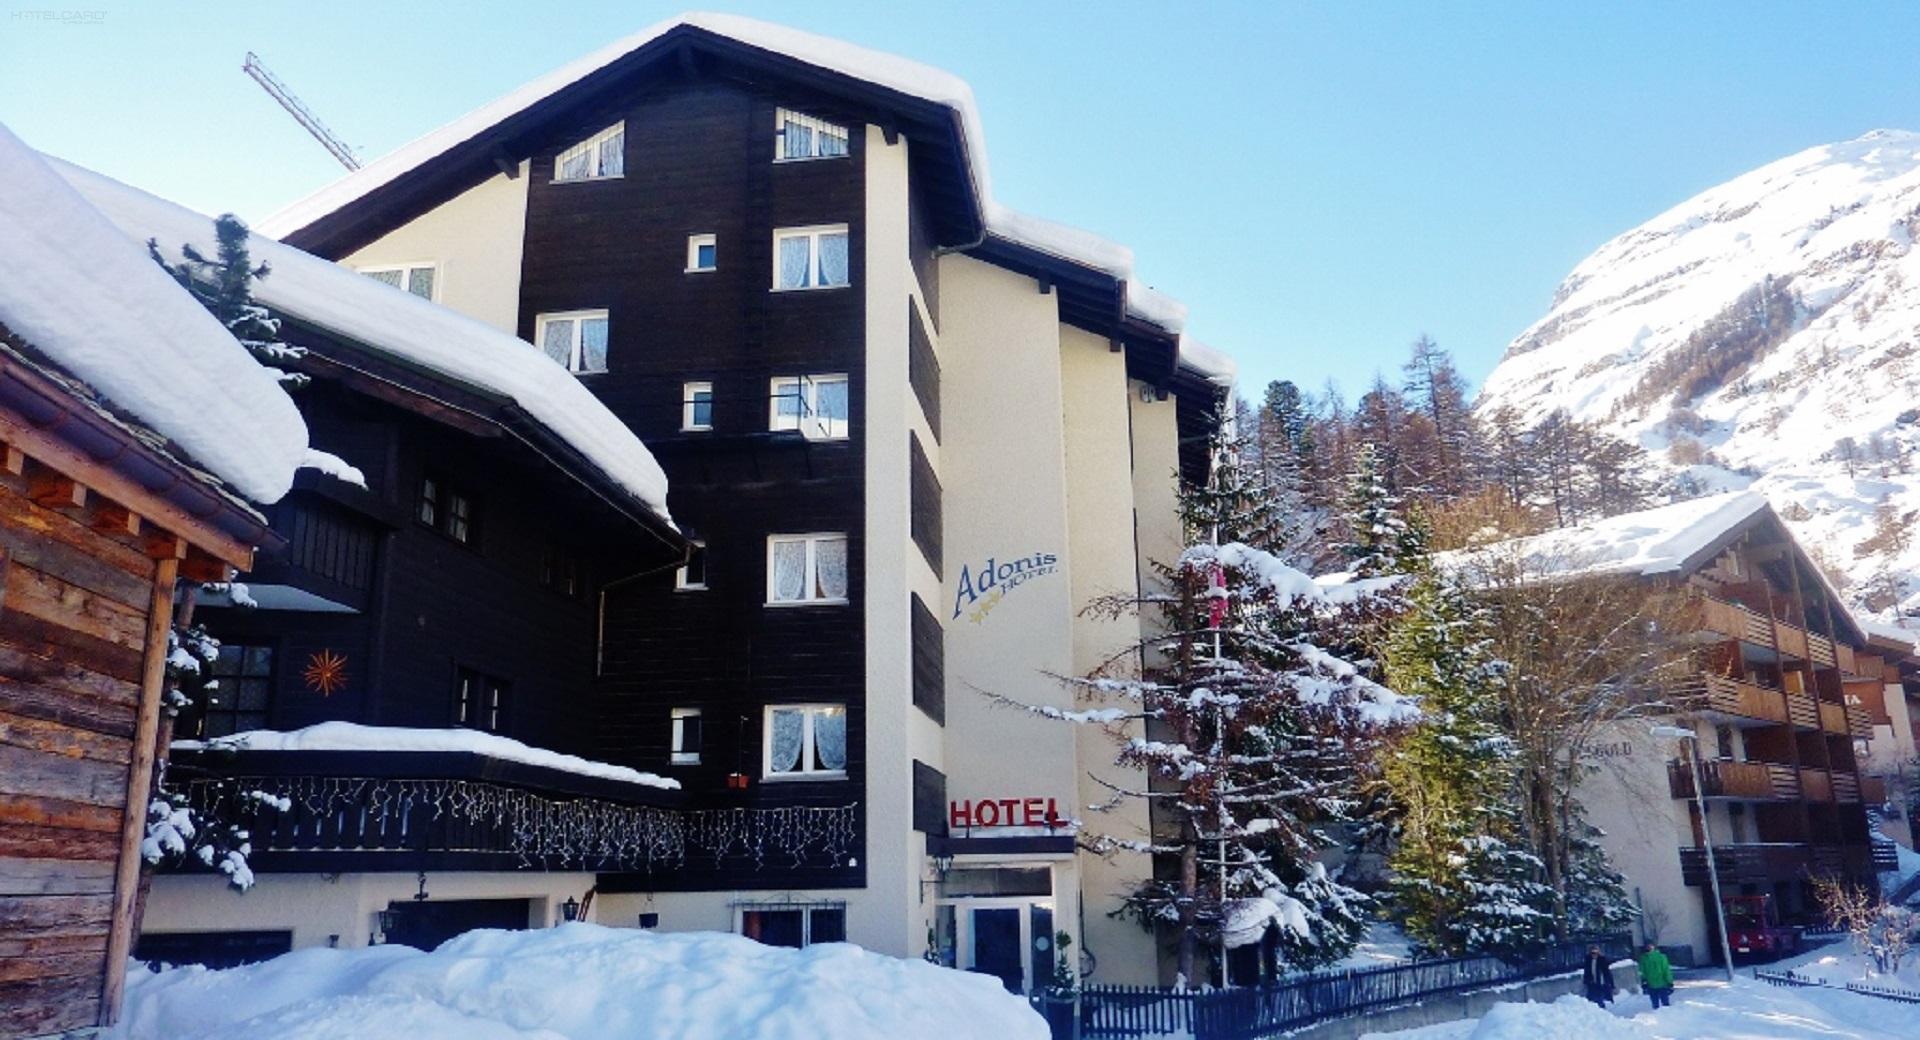 Hotel Adonis 7